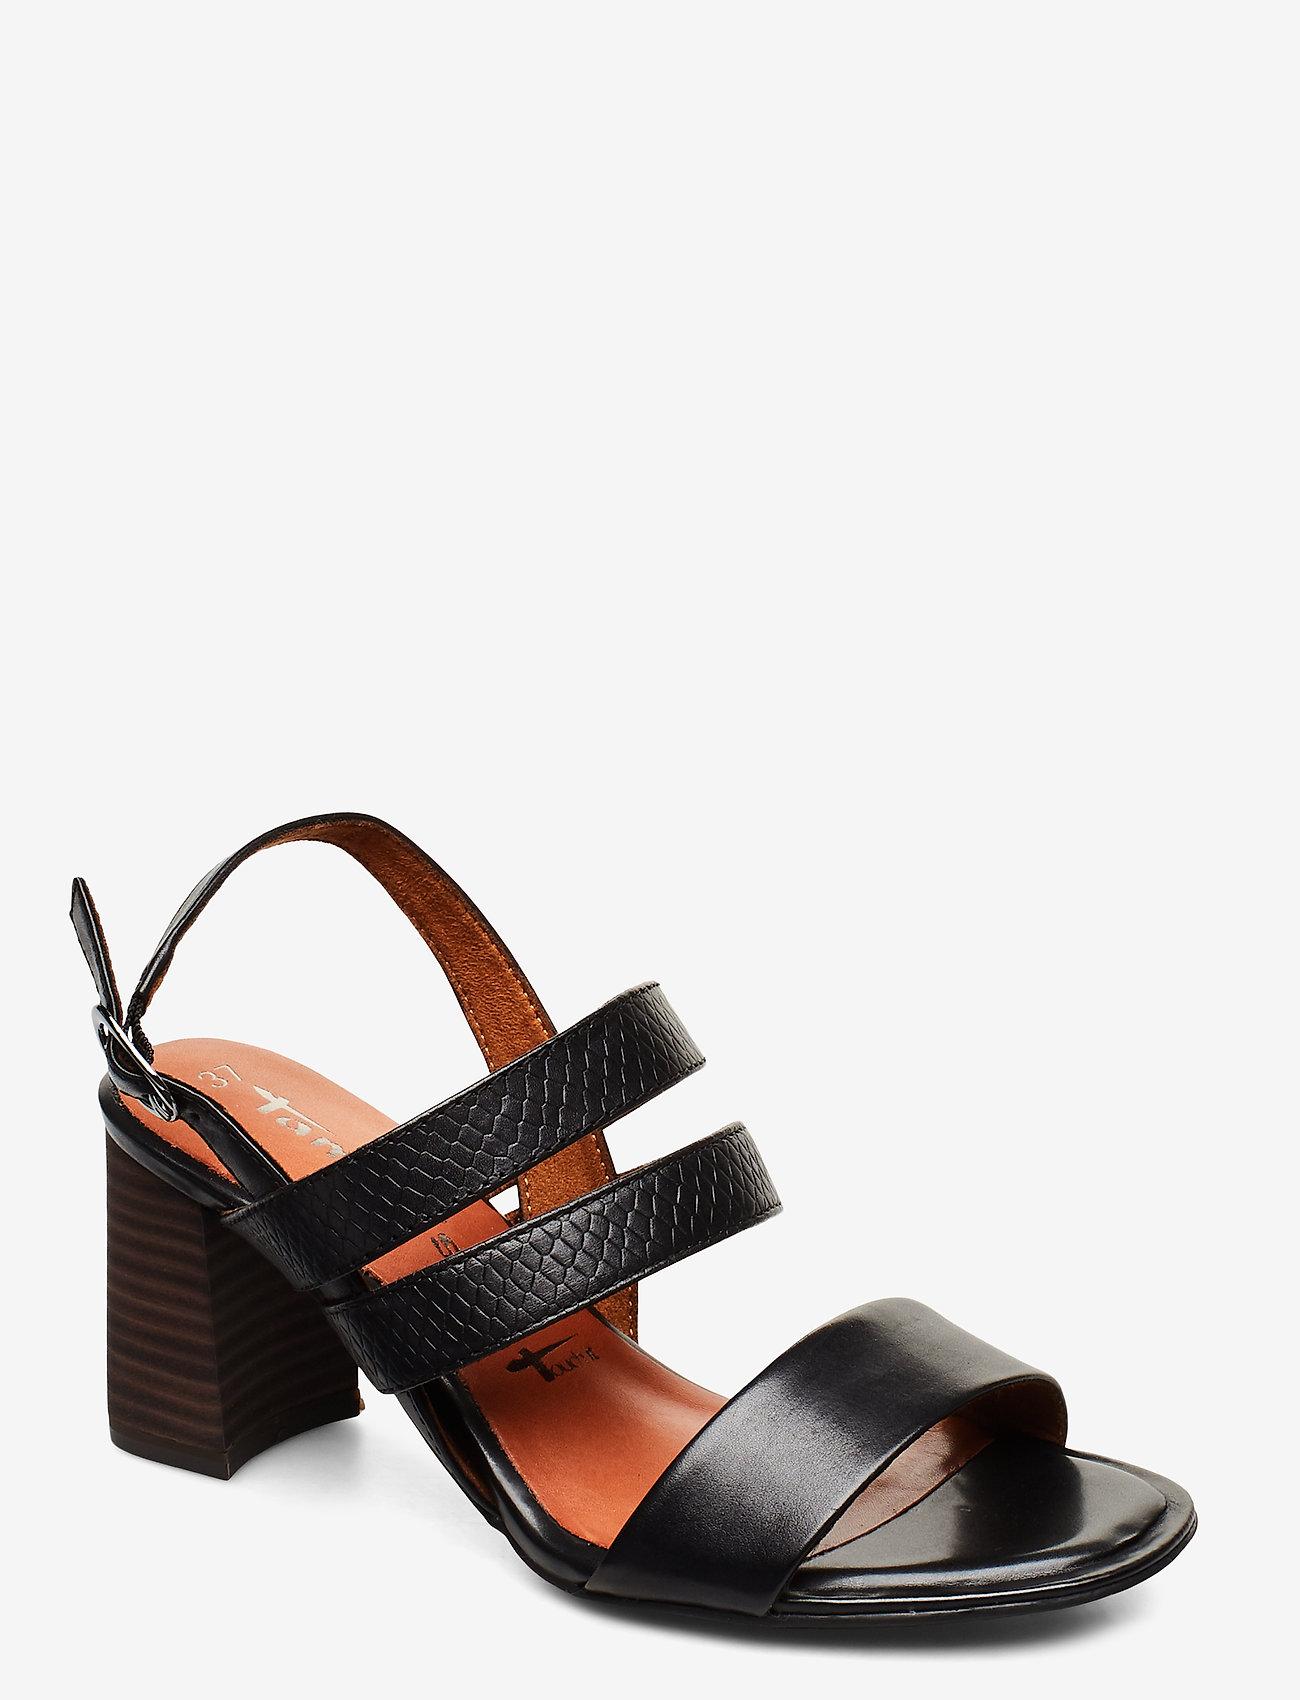 Tamaris - Woms Sandals - sandalen mit absatz - blk lea/snake - 0